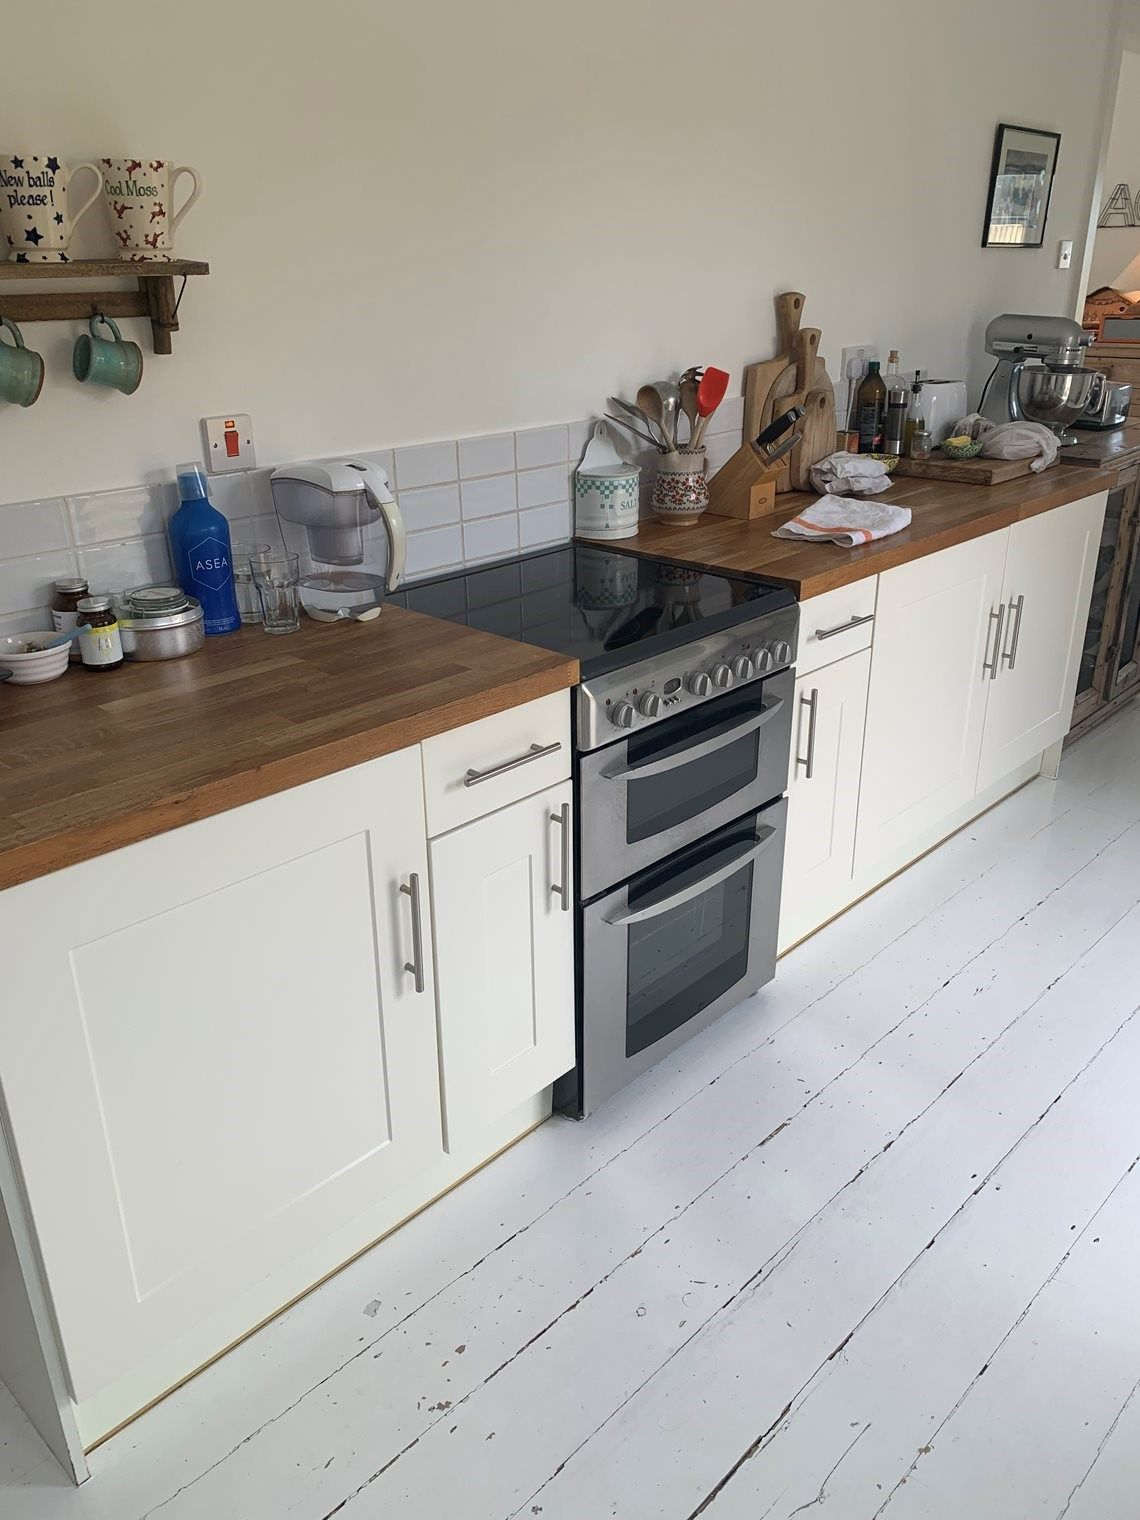 B Q Kitchen Units And Oven Collection St Ouen Kitchen Utility Hall Furniture B Q Kitchens Kitchen Units Hall Furniture